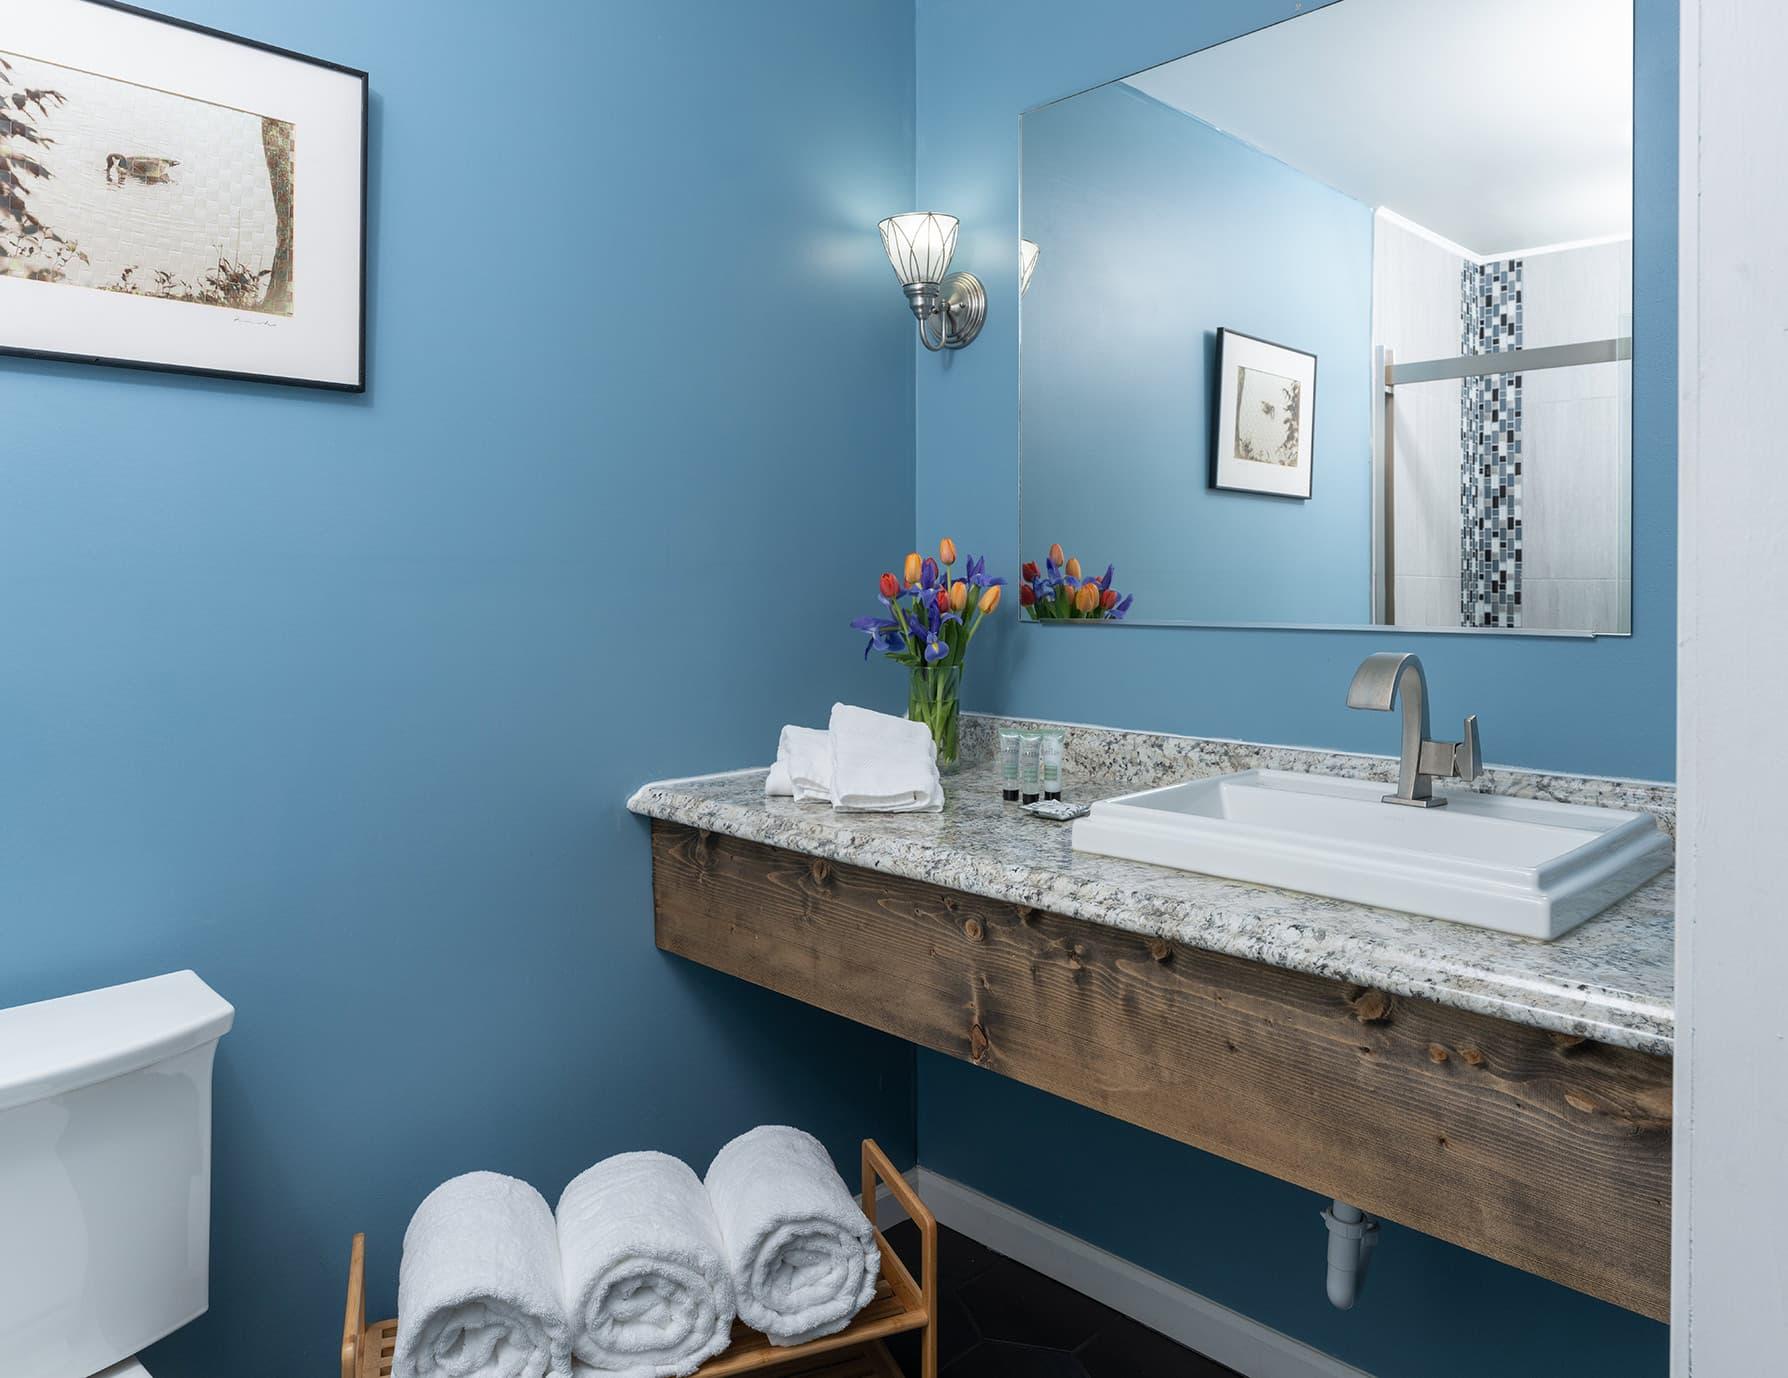 Flyways room bathroom - romantic lodging in West Tennessee